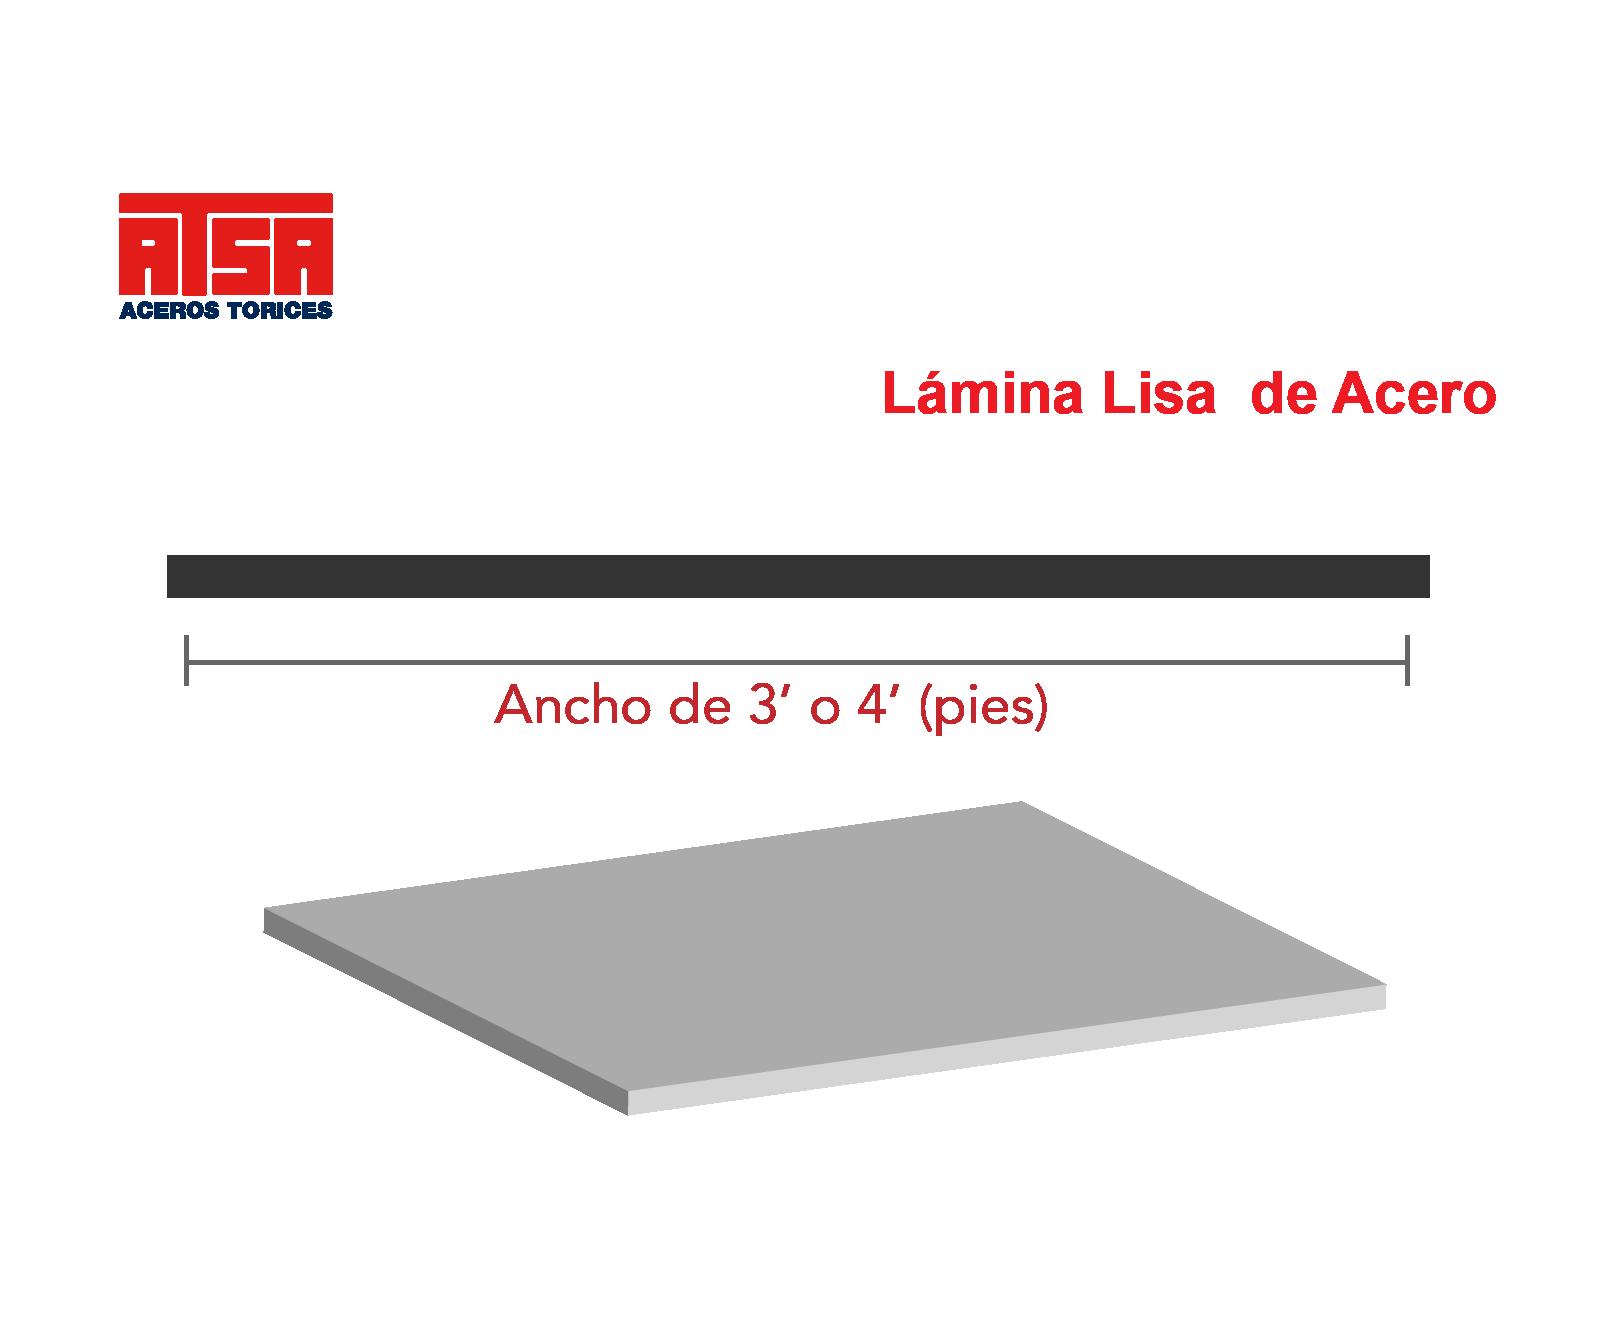 medidas-lamina-lisa-de-aceros-atsa